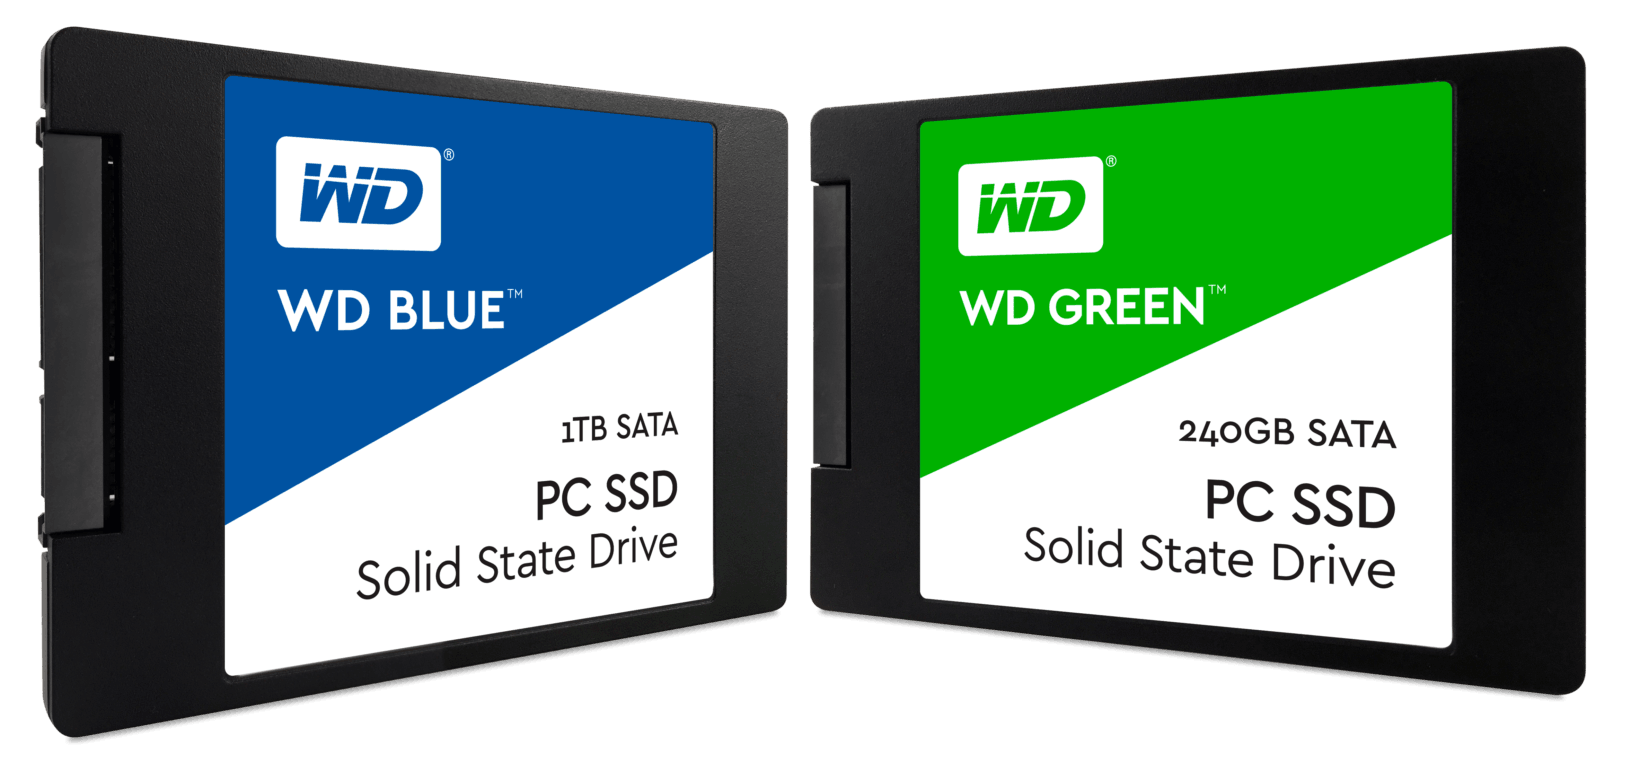 wd-blue-wd-green-sata-1